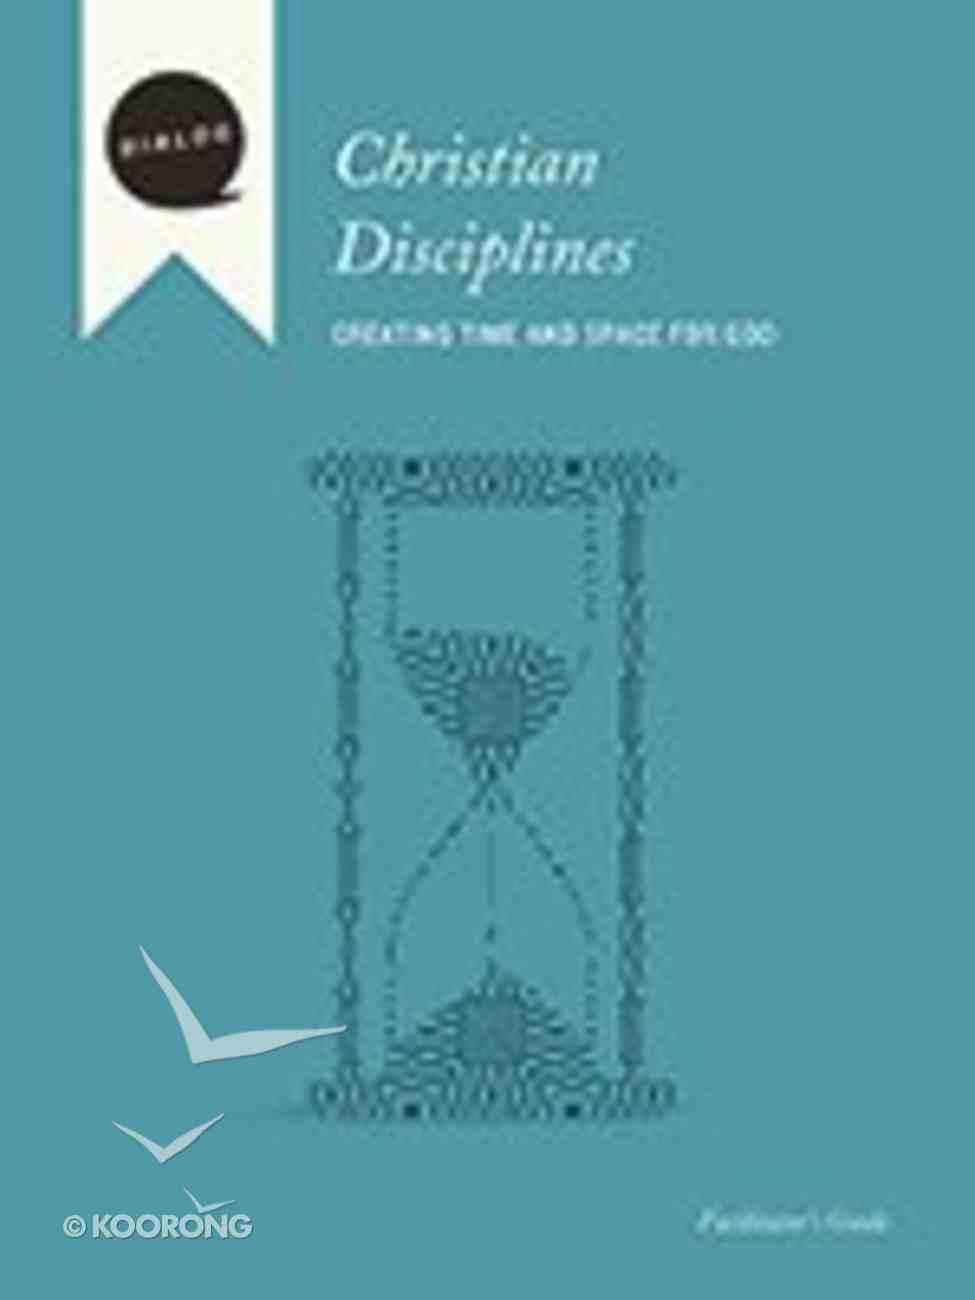 Christian Disciplines (Facilitator's Guide) (Dialog Study Series) Paperback